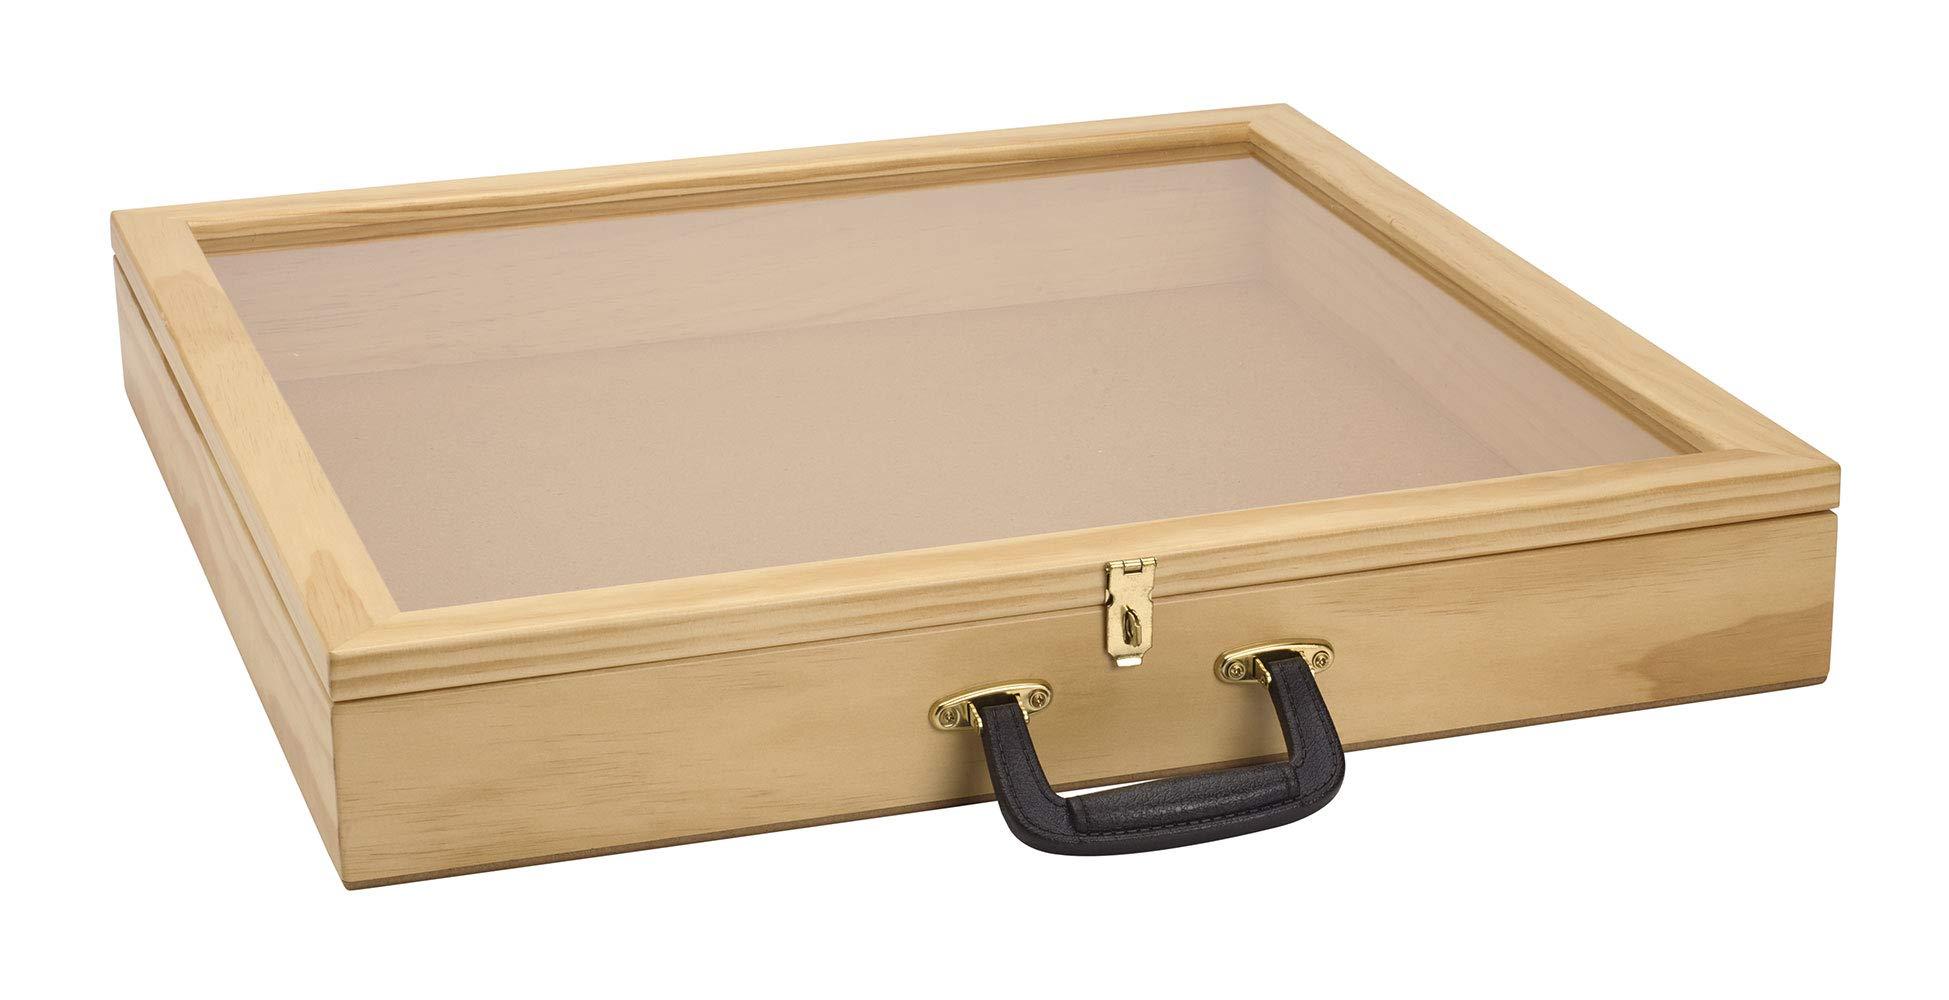 SSWBasics 24 inch Portable Natural Pine Wood Countertop Display Case - 24'' W x 24'' L x 3'' D